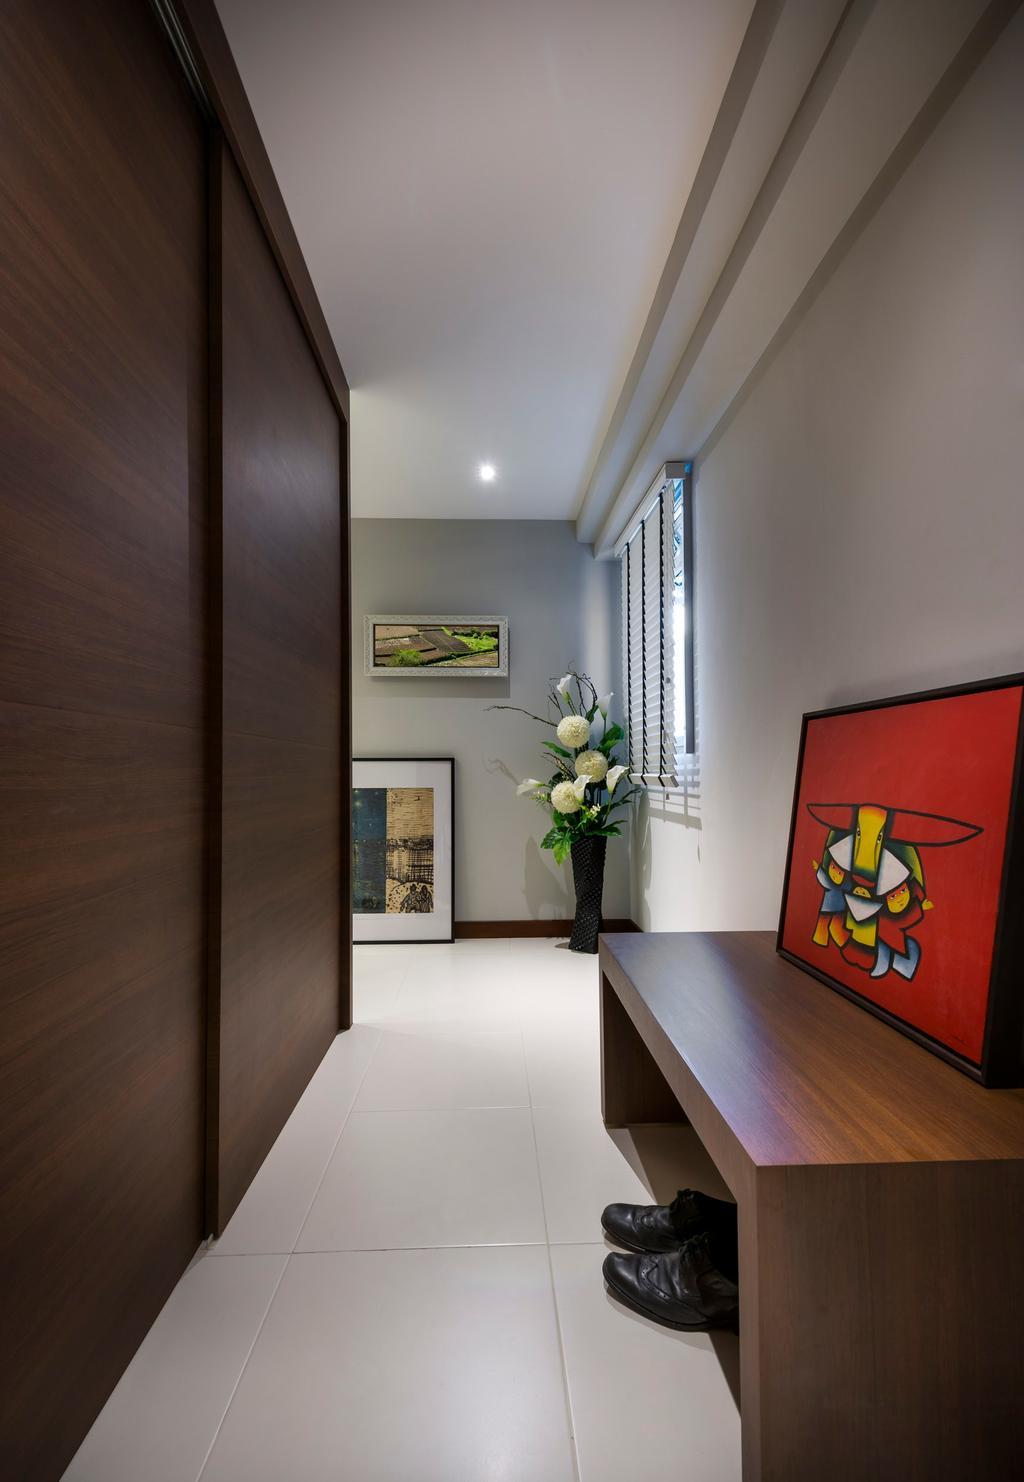 Contemporary, HDB, Punggol Walk, Interior Designer, M3 Studio, Cabinet, Wood, Laminate, Wood Laminate, Bench, Tile, Tiles, White, Painting, Plants, Corridor